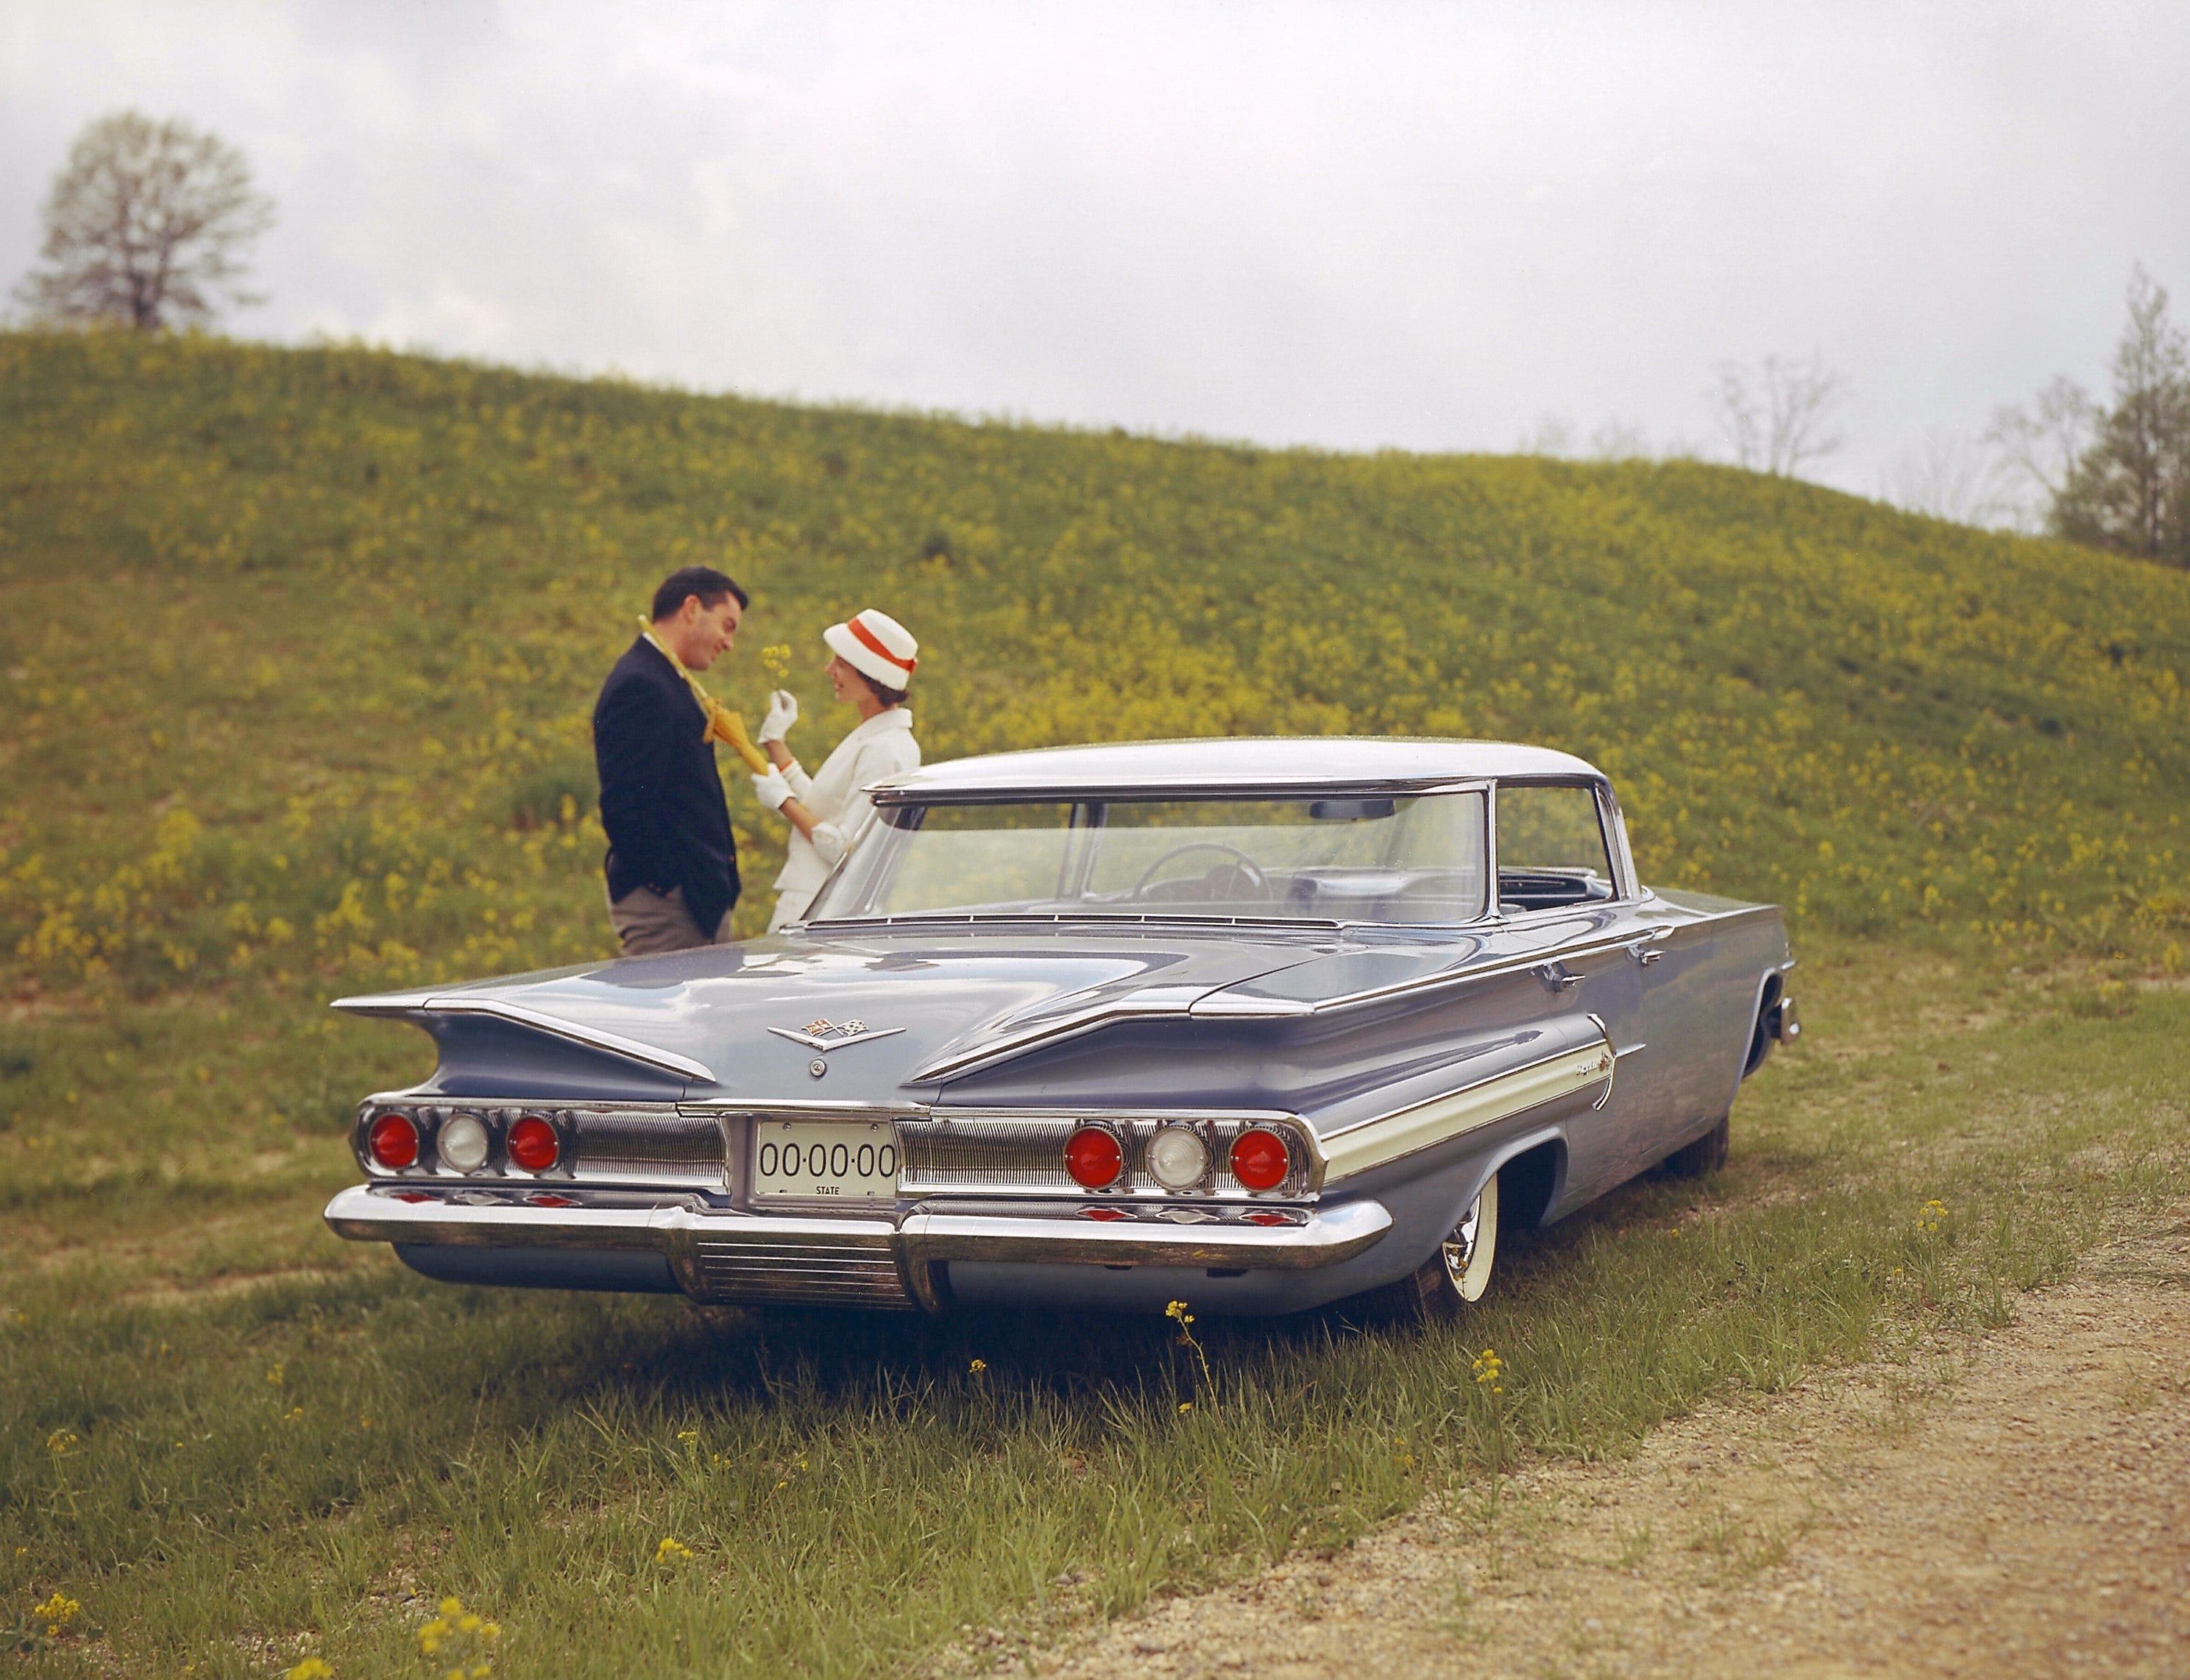 https://www.gannett-cdn.com/presto/2020/02/26/PDTN/2921d01b-a98e-4752-b83e-b145b98d7e46-1960_Impala_Sport_Sedan_C660-U0003.jpg